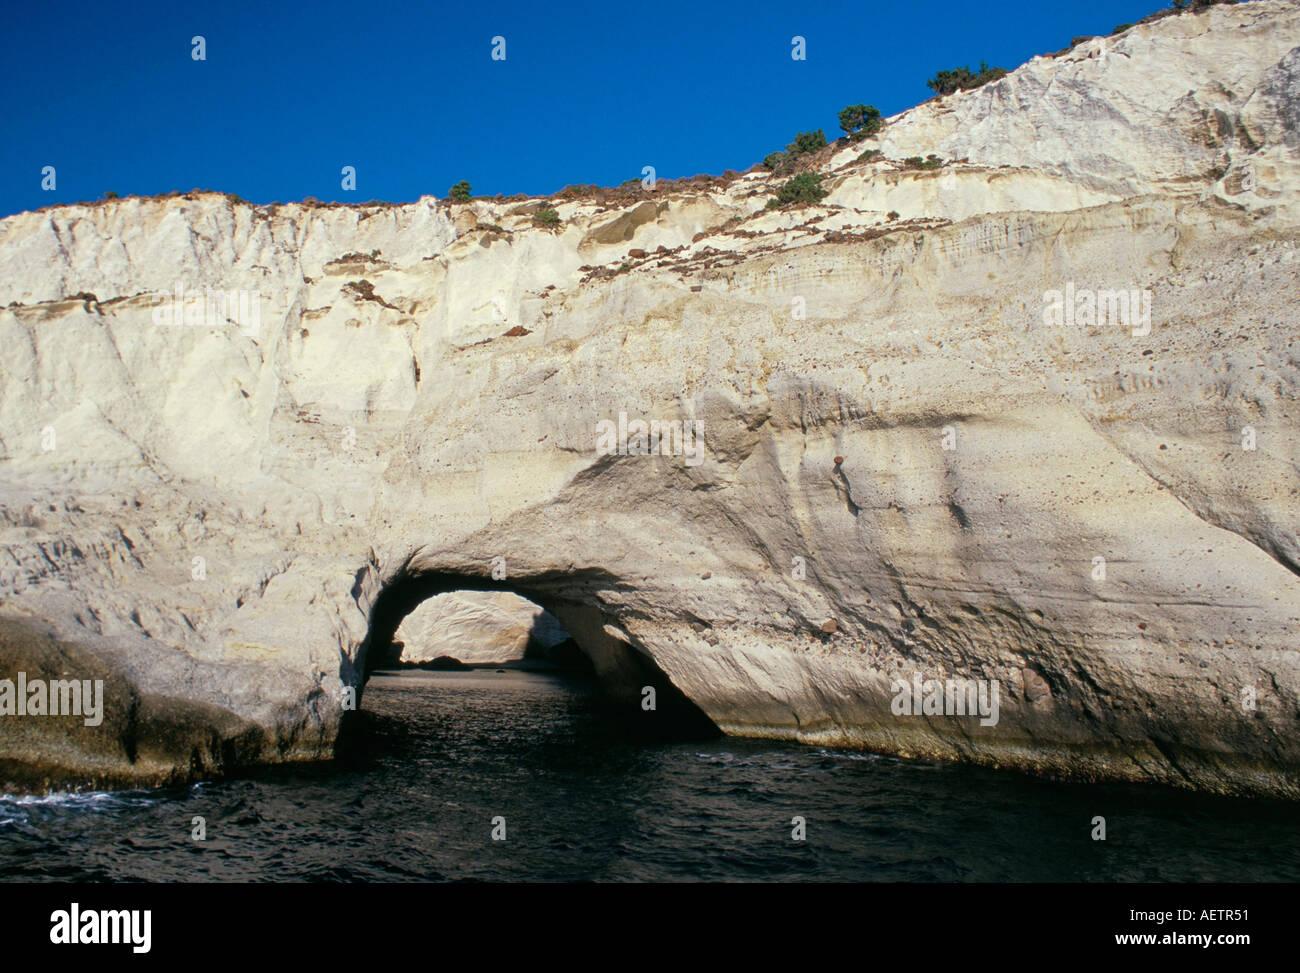 Volcanic rock formations on south eastern coast near Kleftiko Milos Cyclades islands Greece Mediterranean Europe - Stock Image